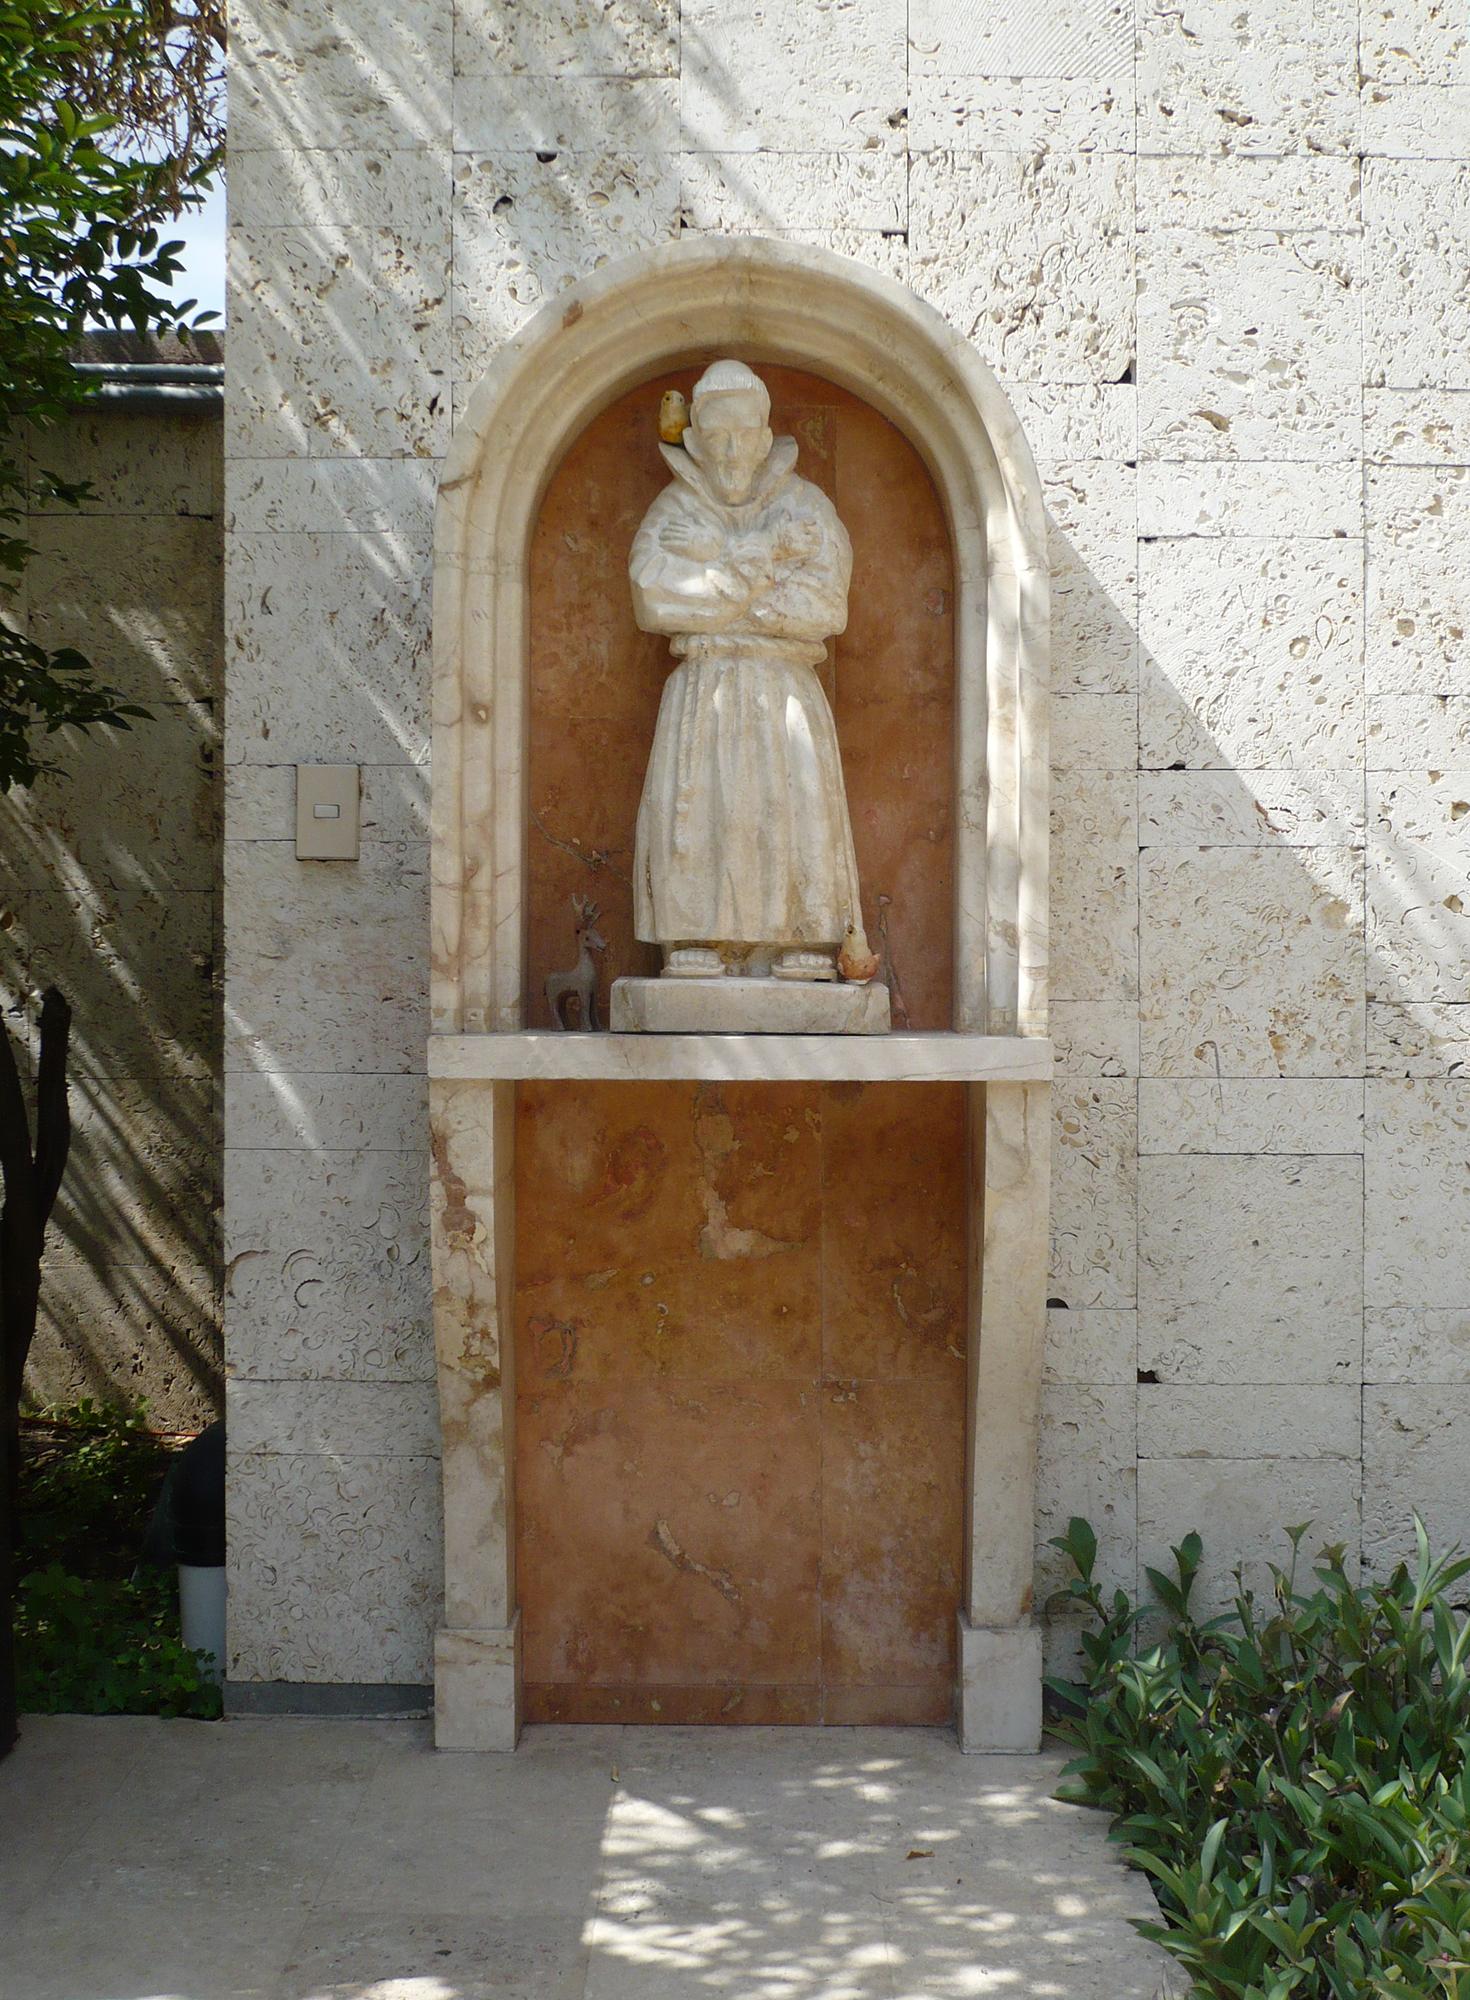 St. Francis_1470x2000_P1070601.jpg